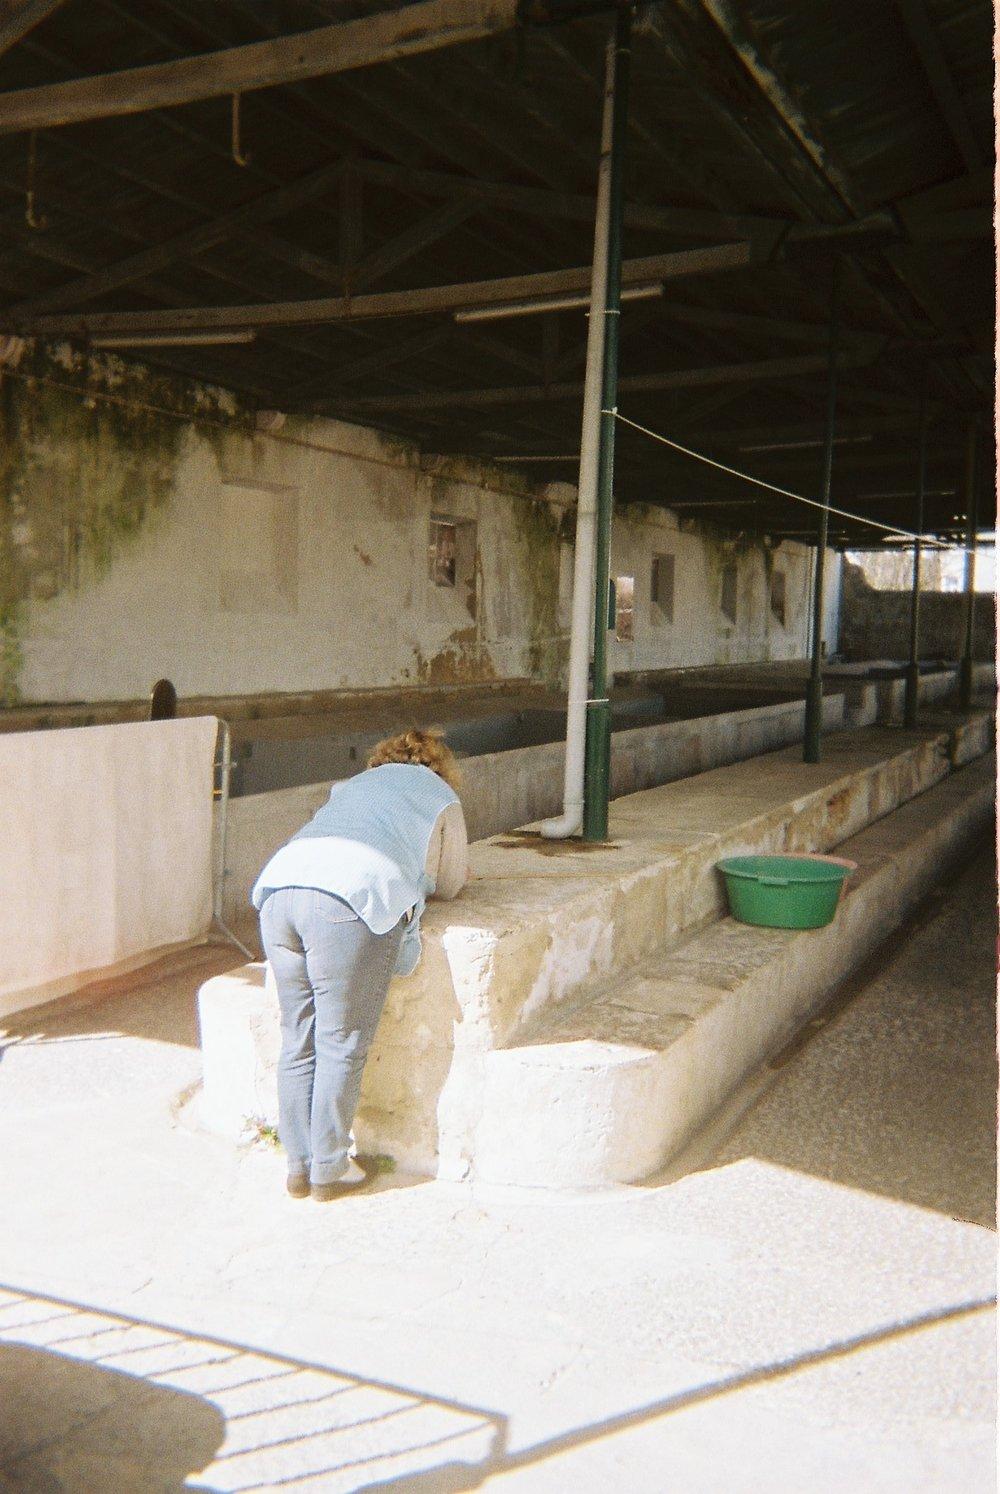 Dona Fernanda at the public washhouse